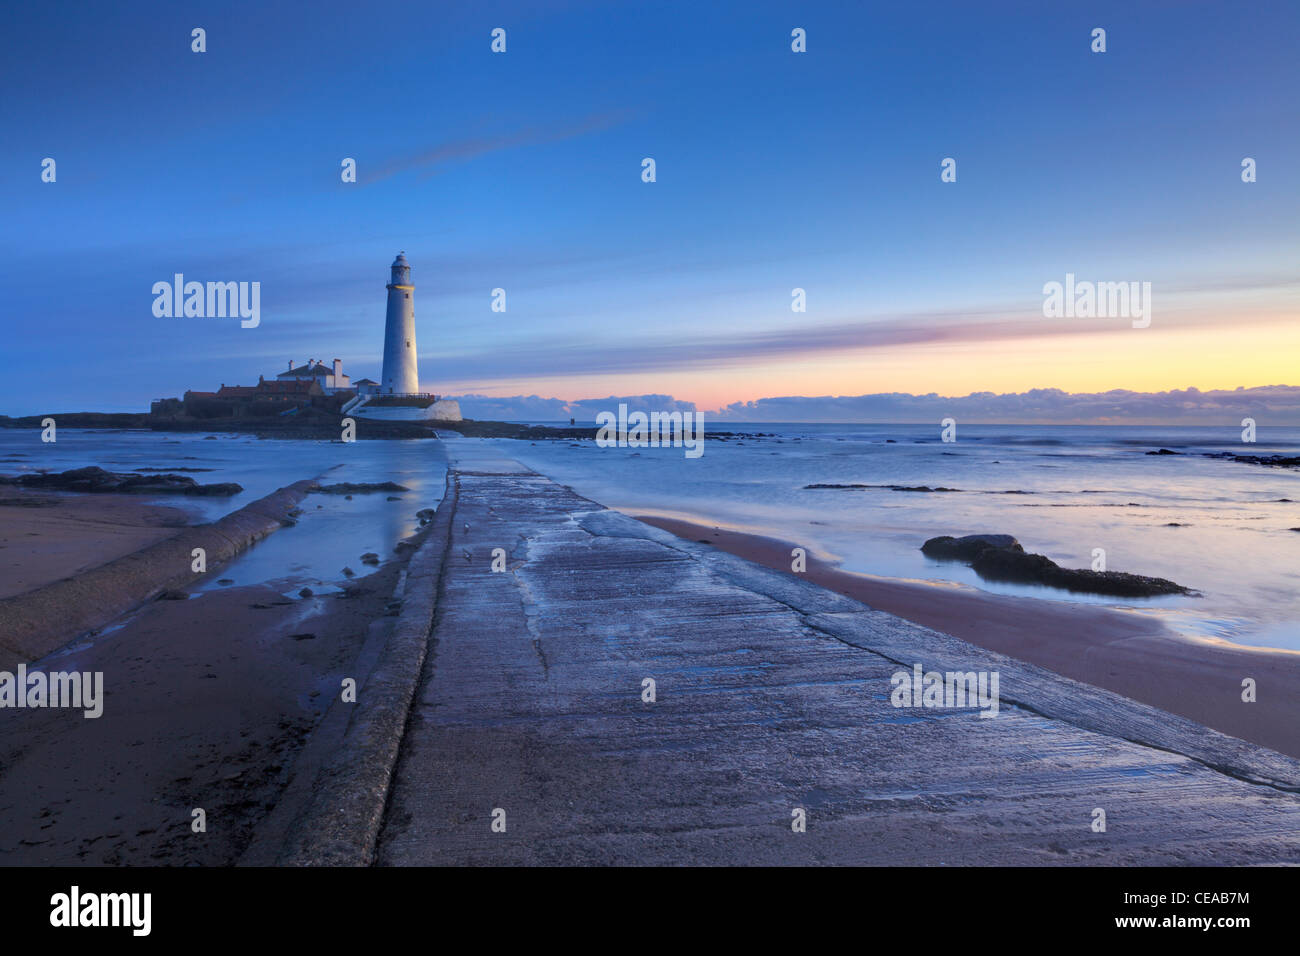 Twilight sur St Marys phare à Whitley Bay North Tyneside, Tyne et Wear, Northumberland, England Photo Stock